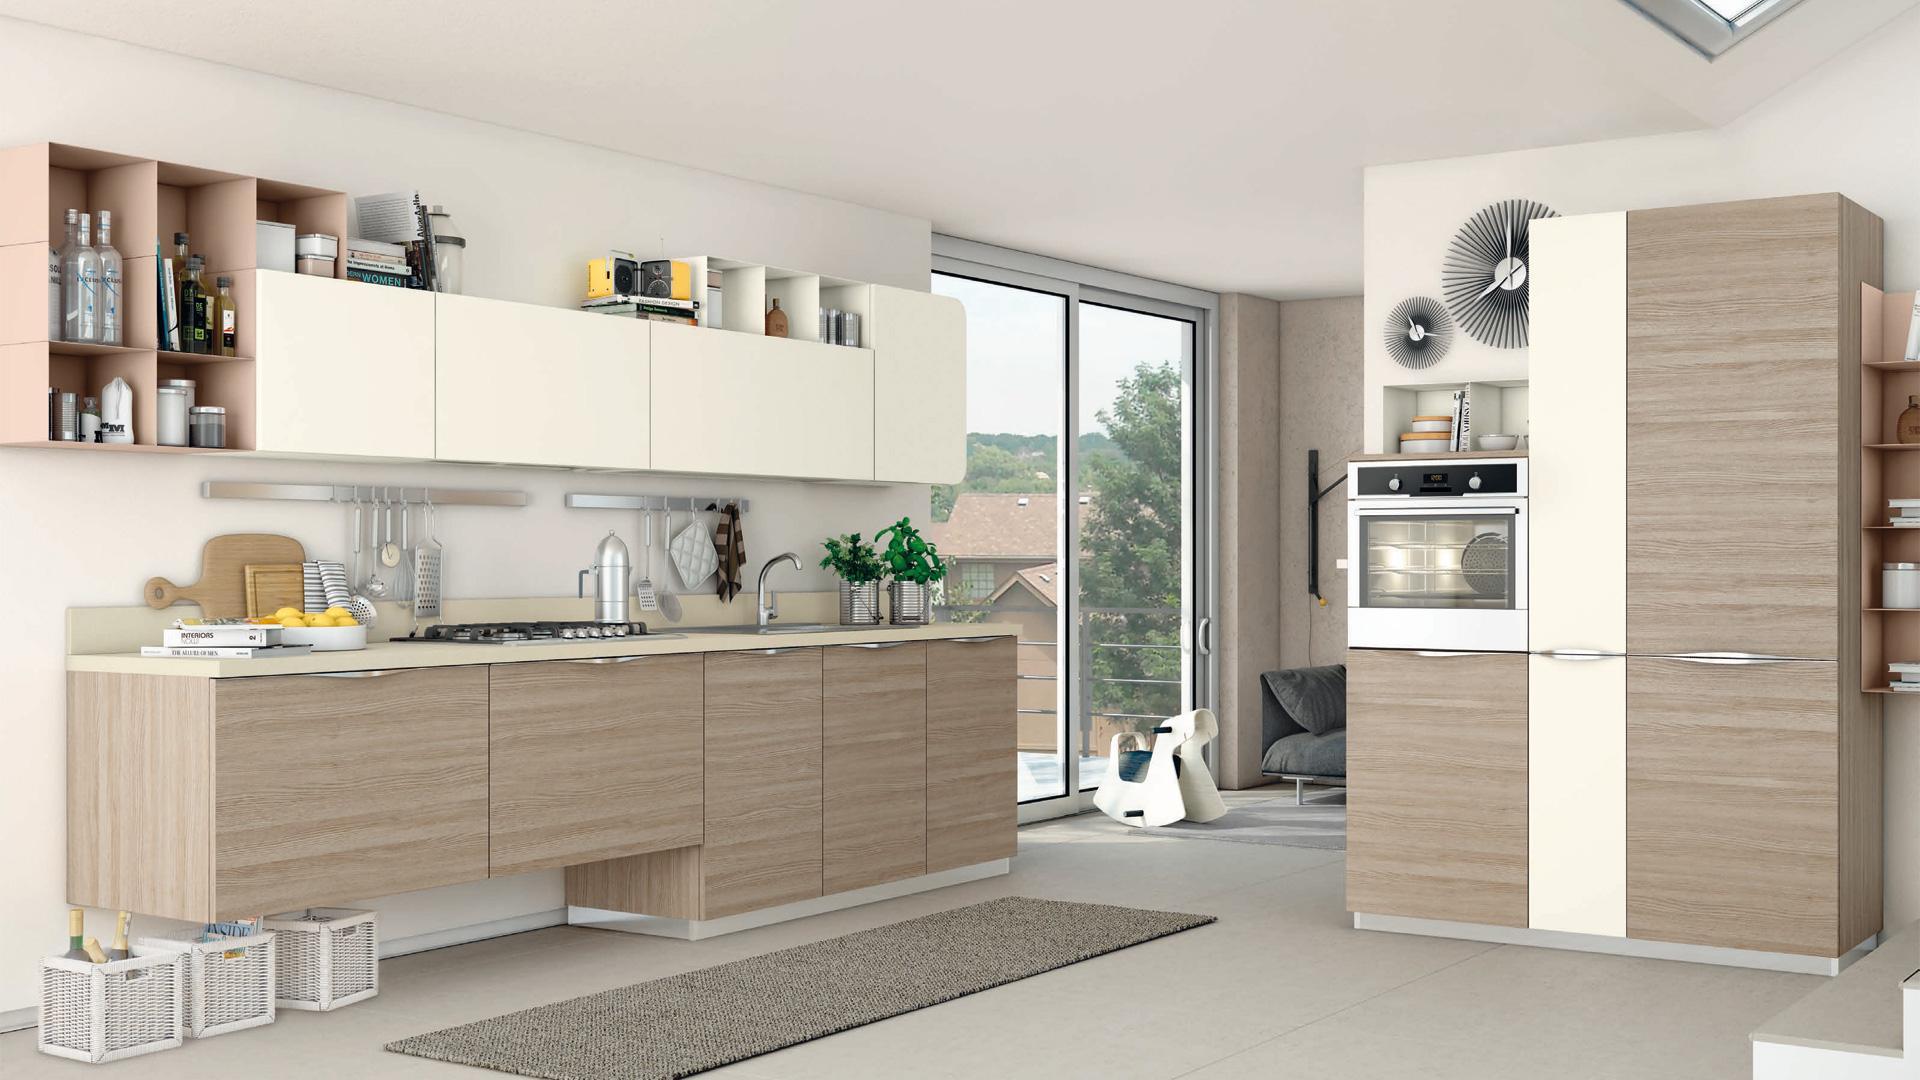 Cucine centro cucina - Cucine moderne colori ...